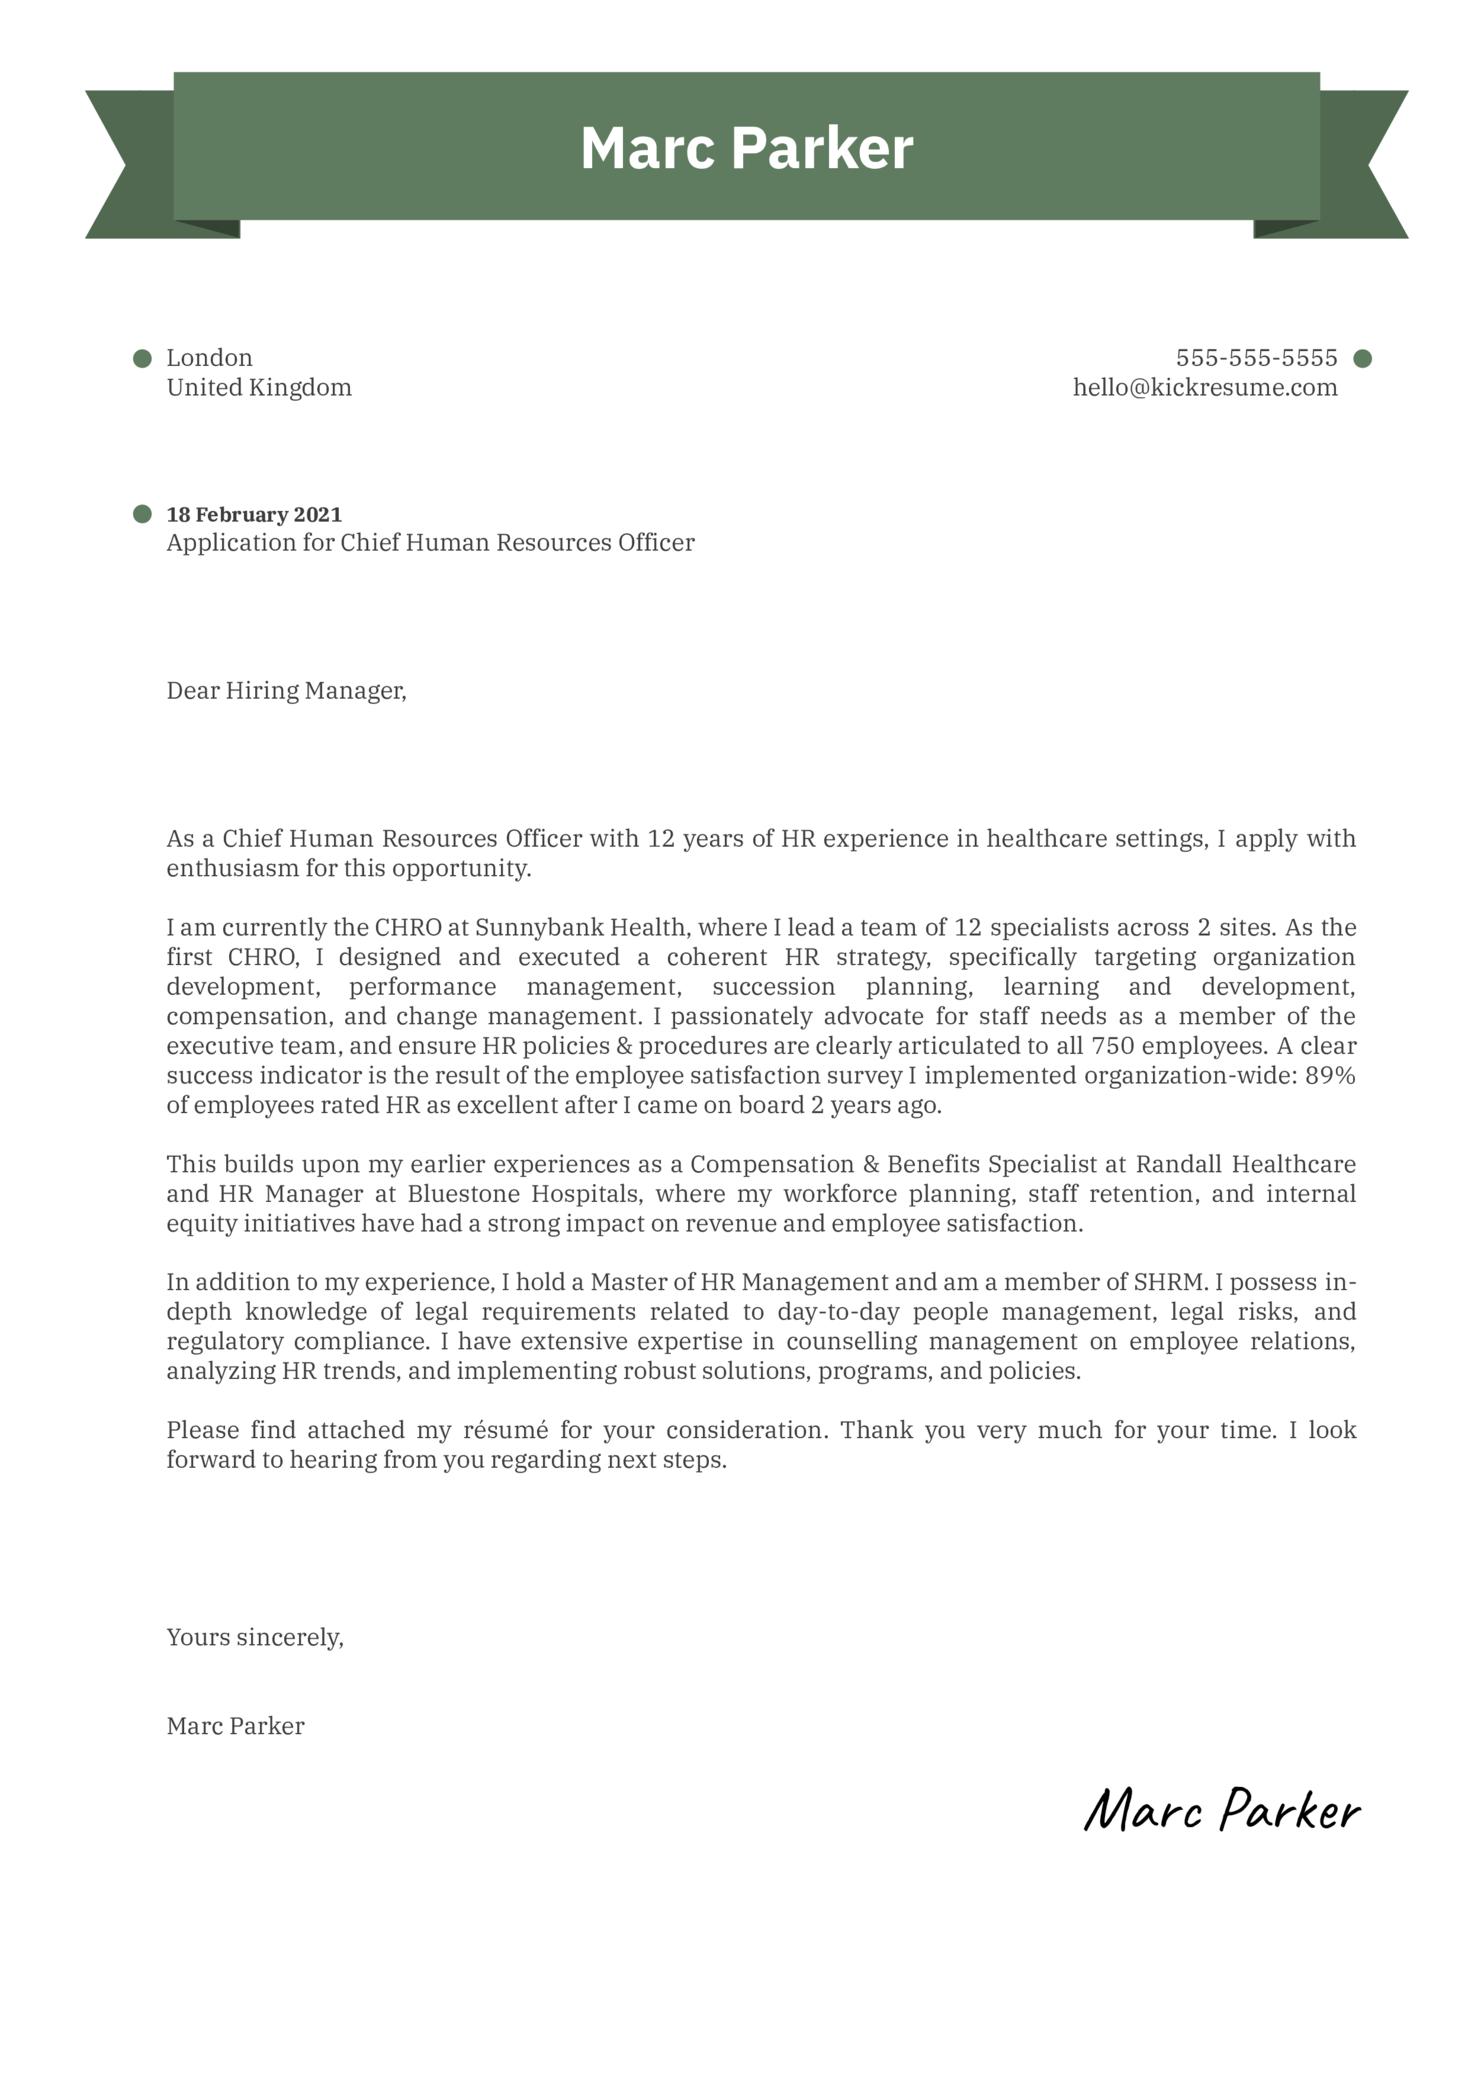 CHRO Cover Letter Template